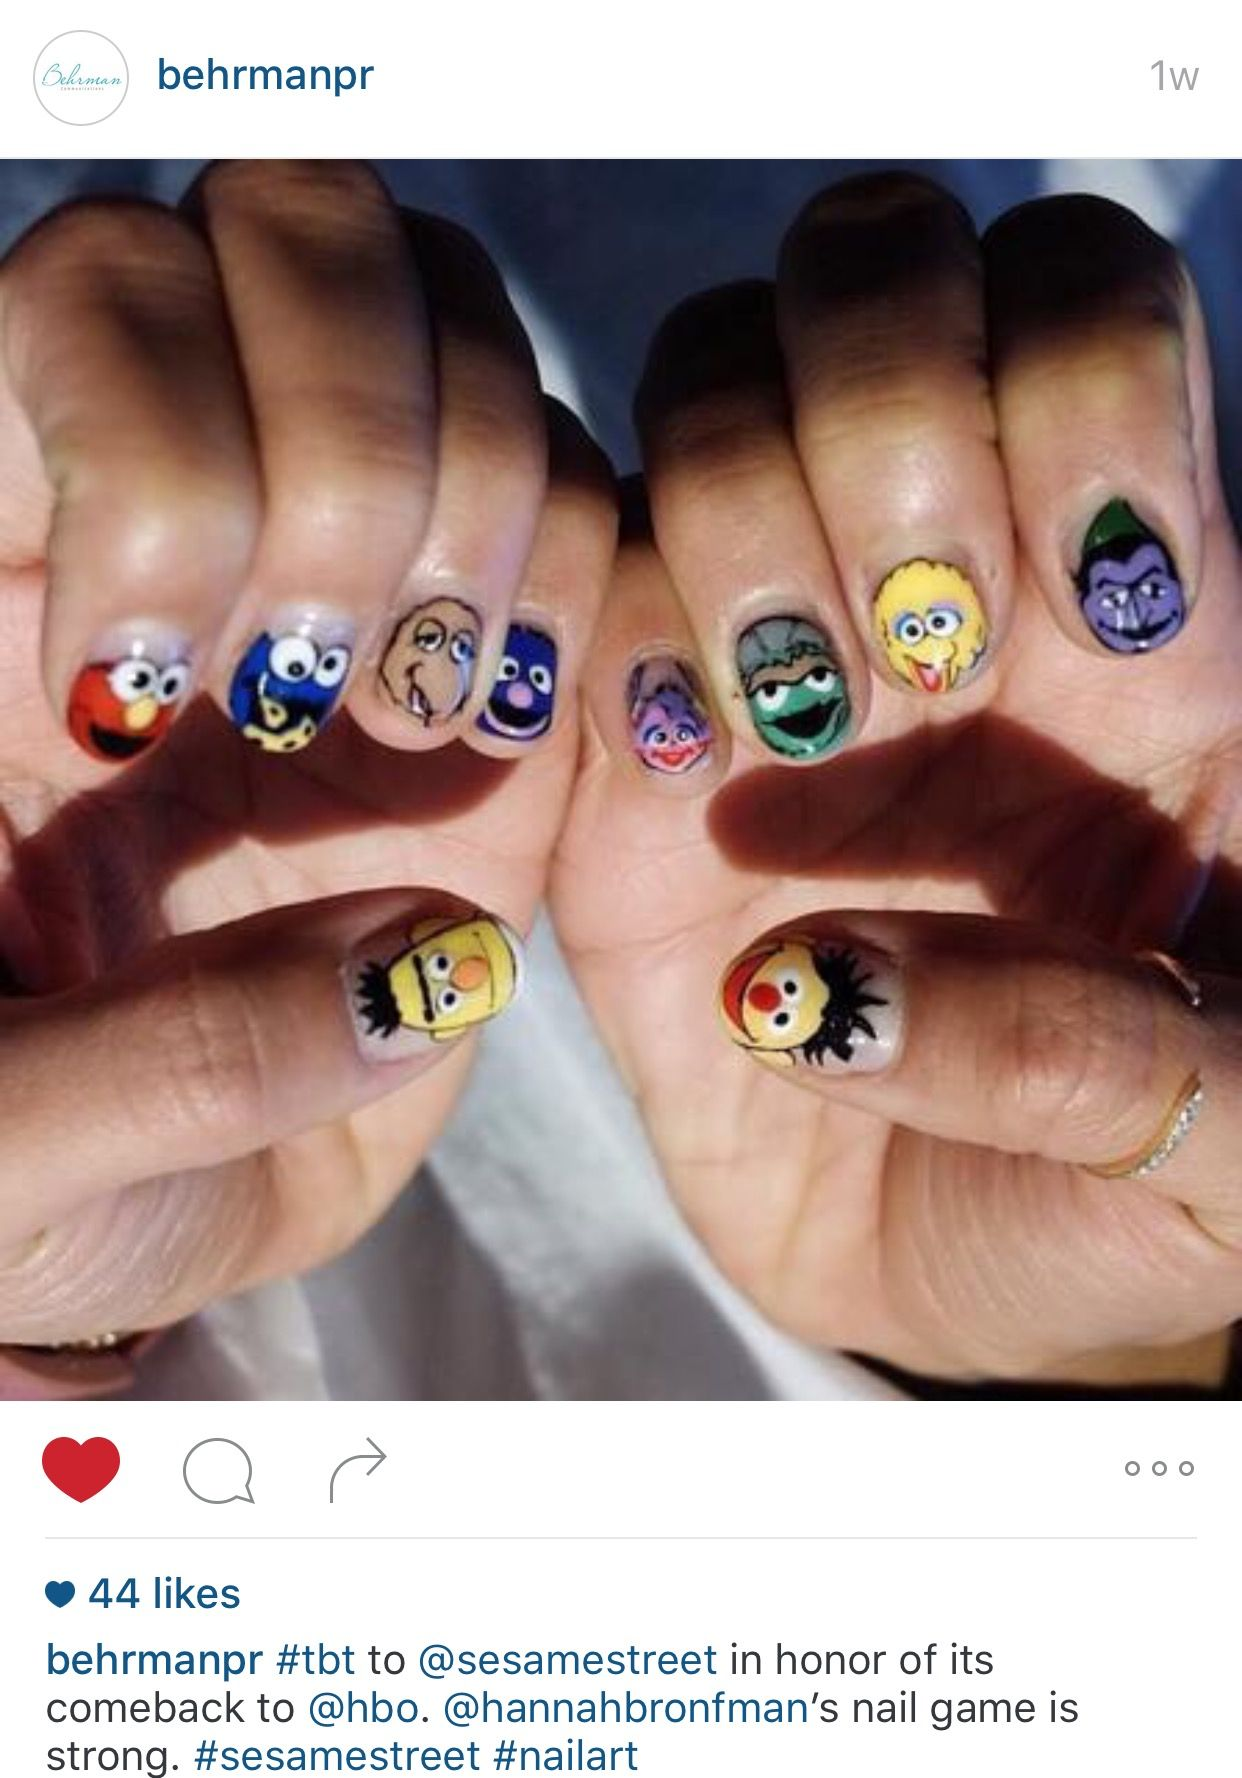 Sesame Street Nail Art Nails Pinterest Sesame Streets